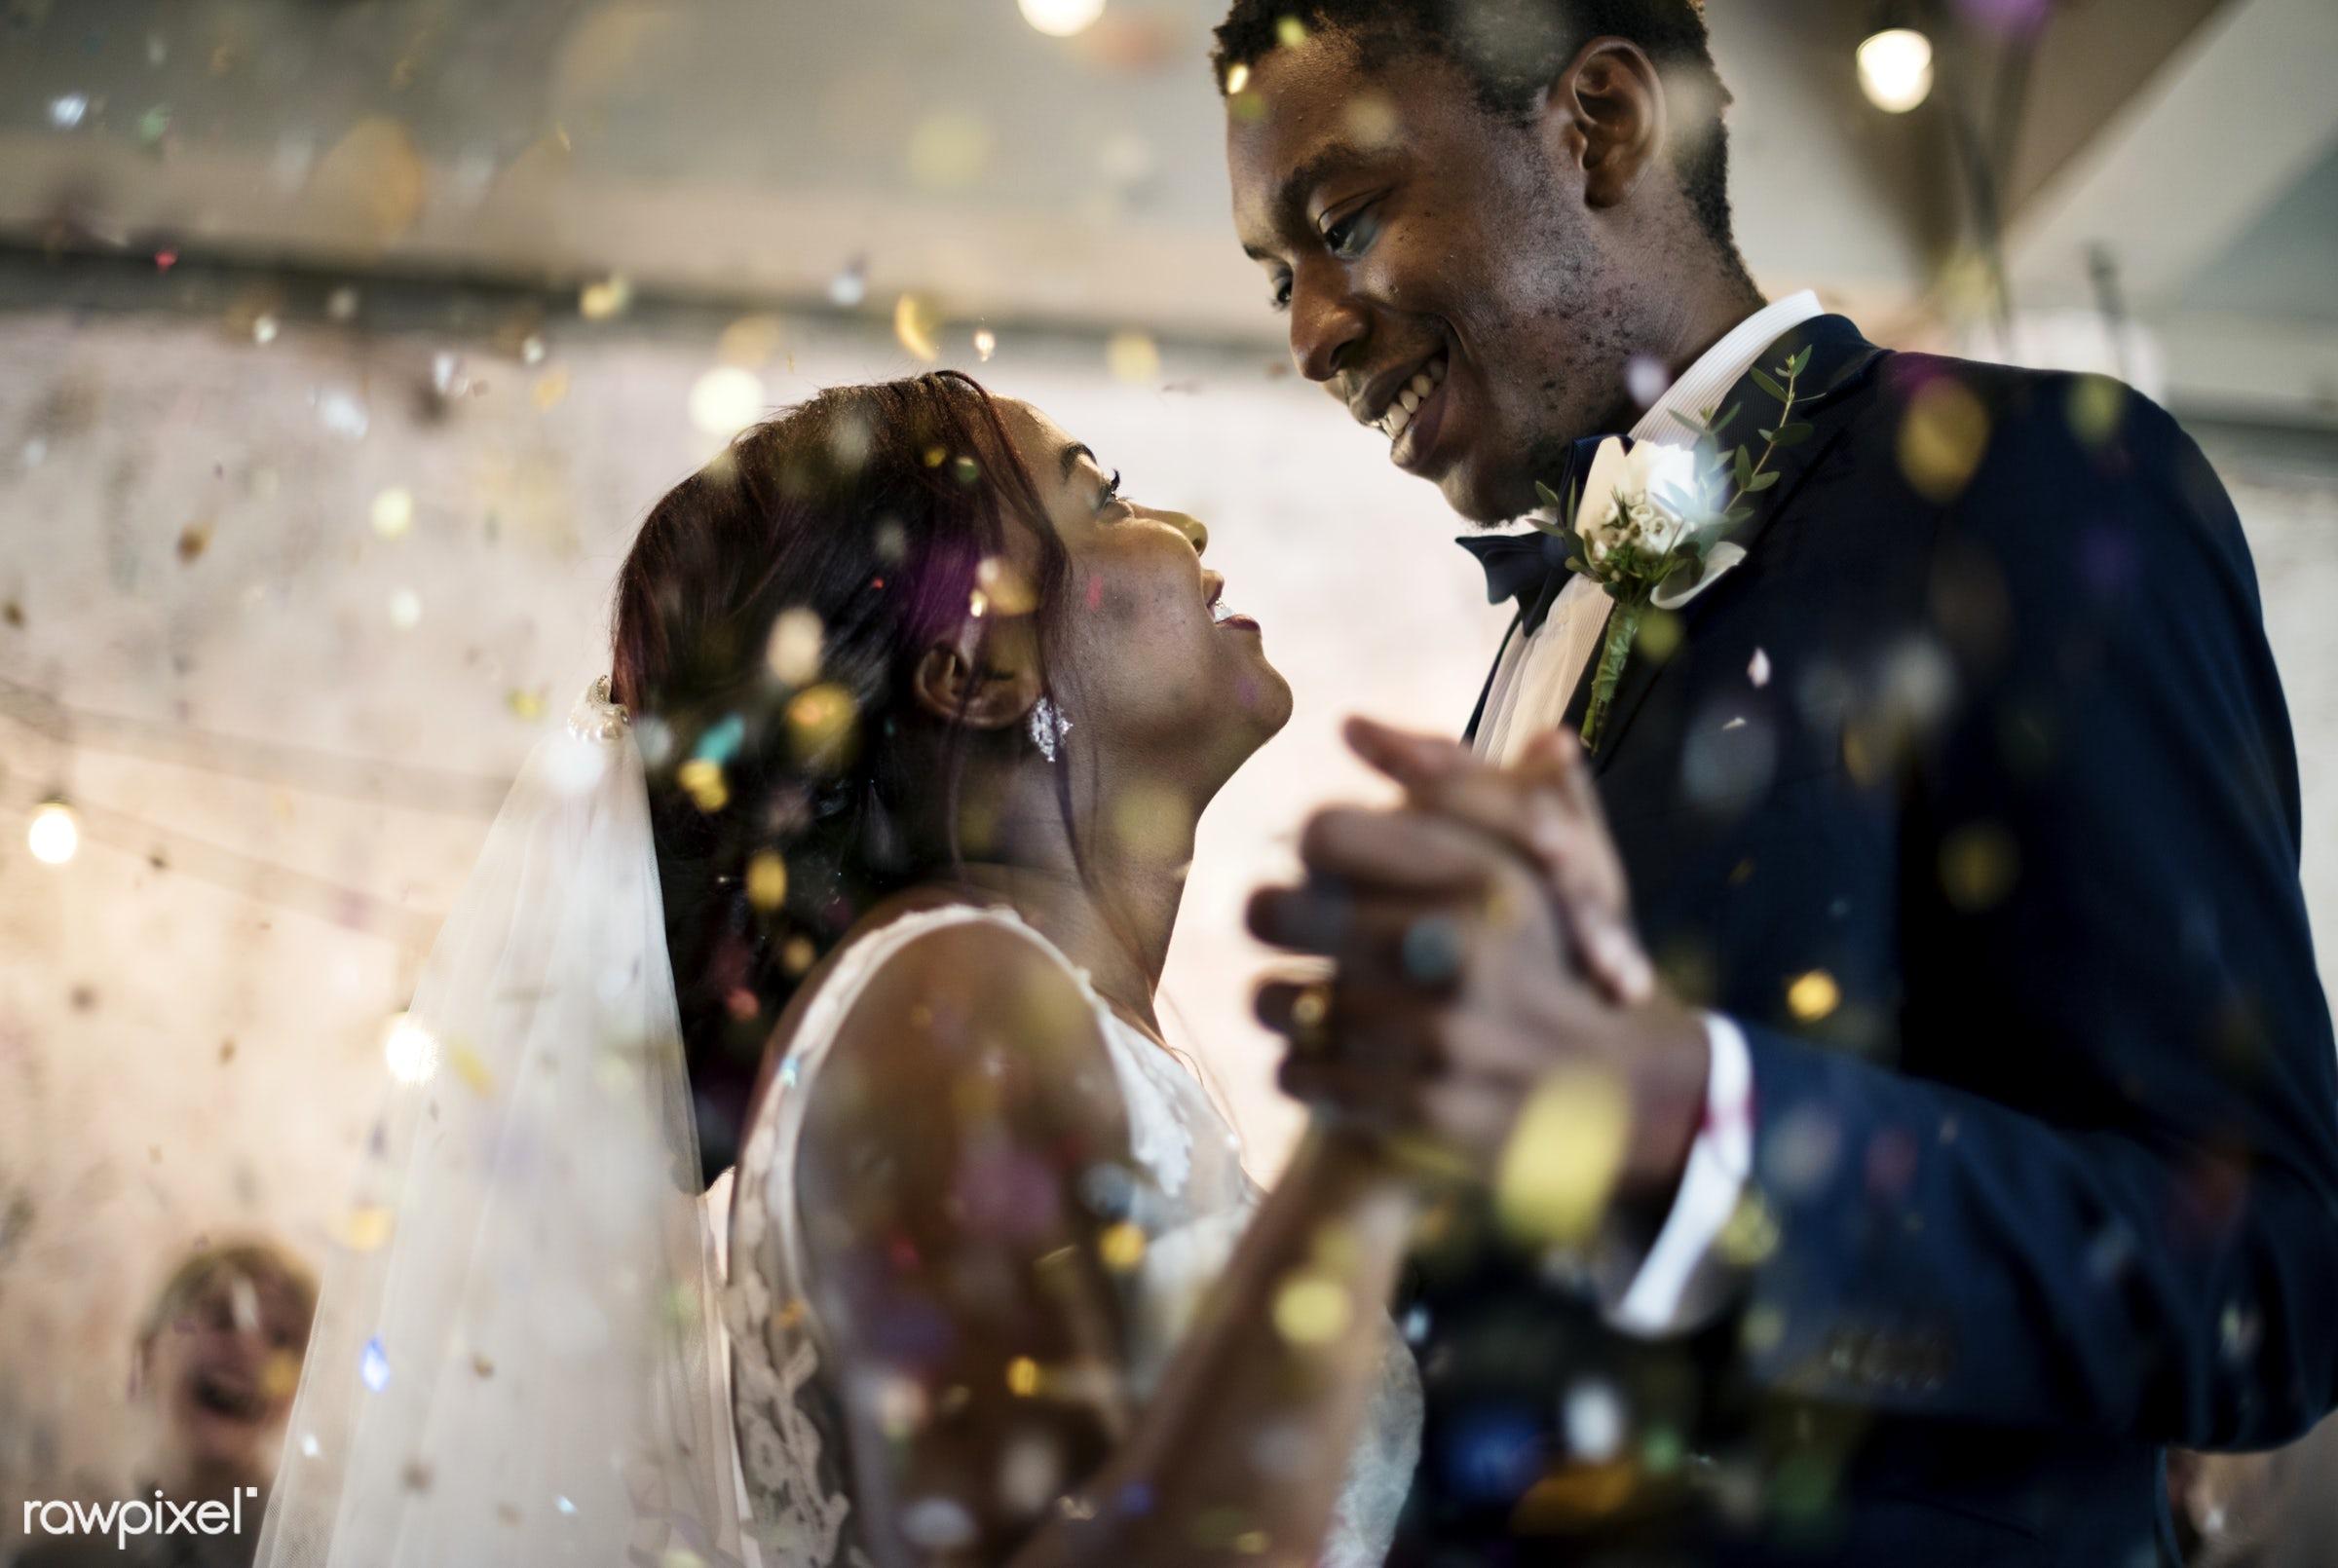 Bridge and groom wedding day - wedding, bride, affection, african descent, black, celebration, cheerful, confetti, couple,...